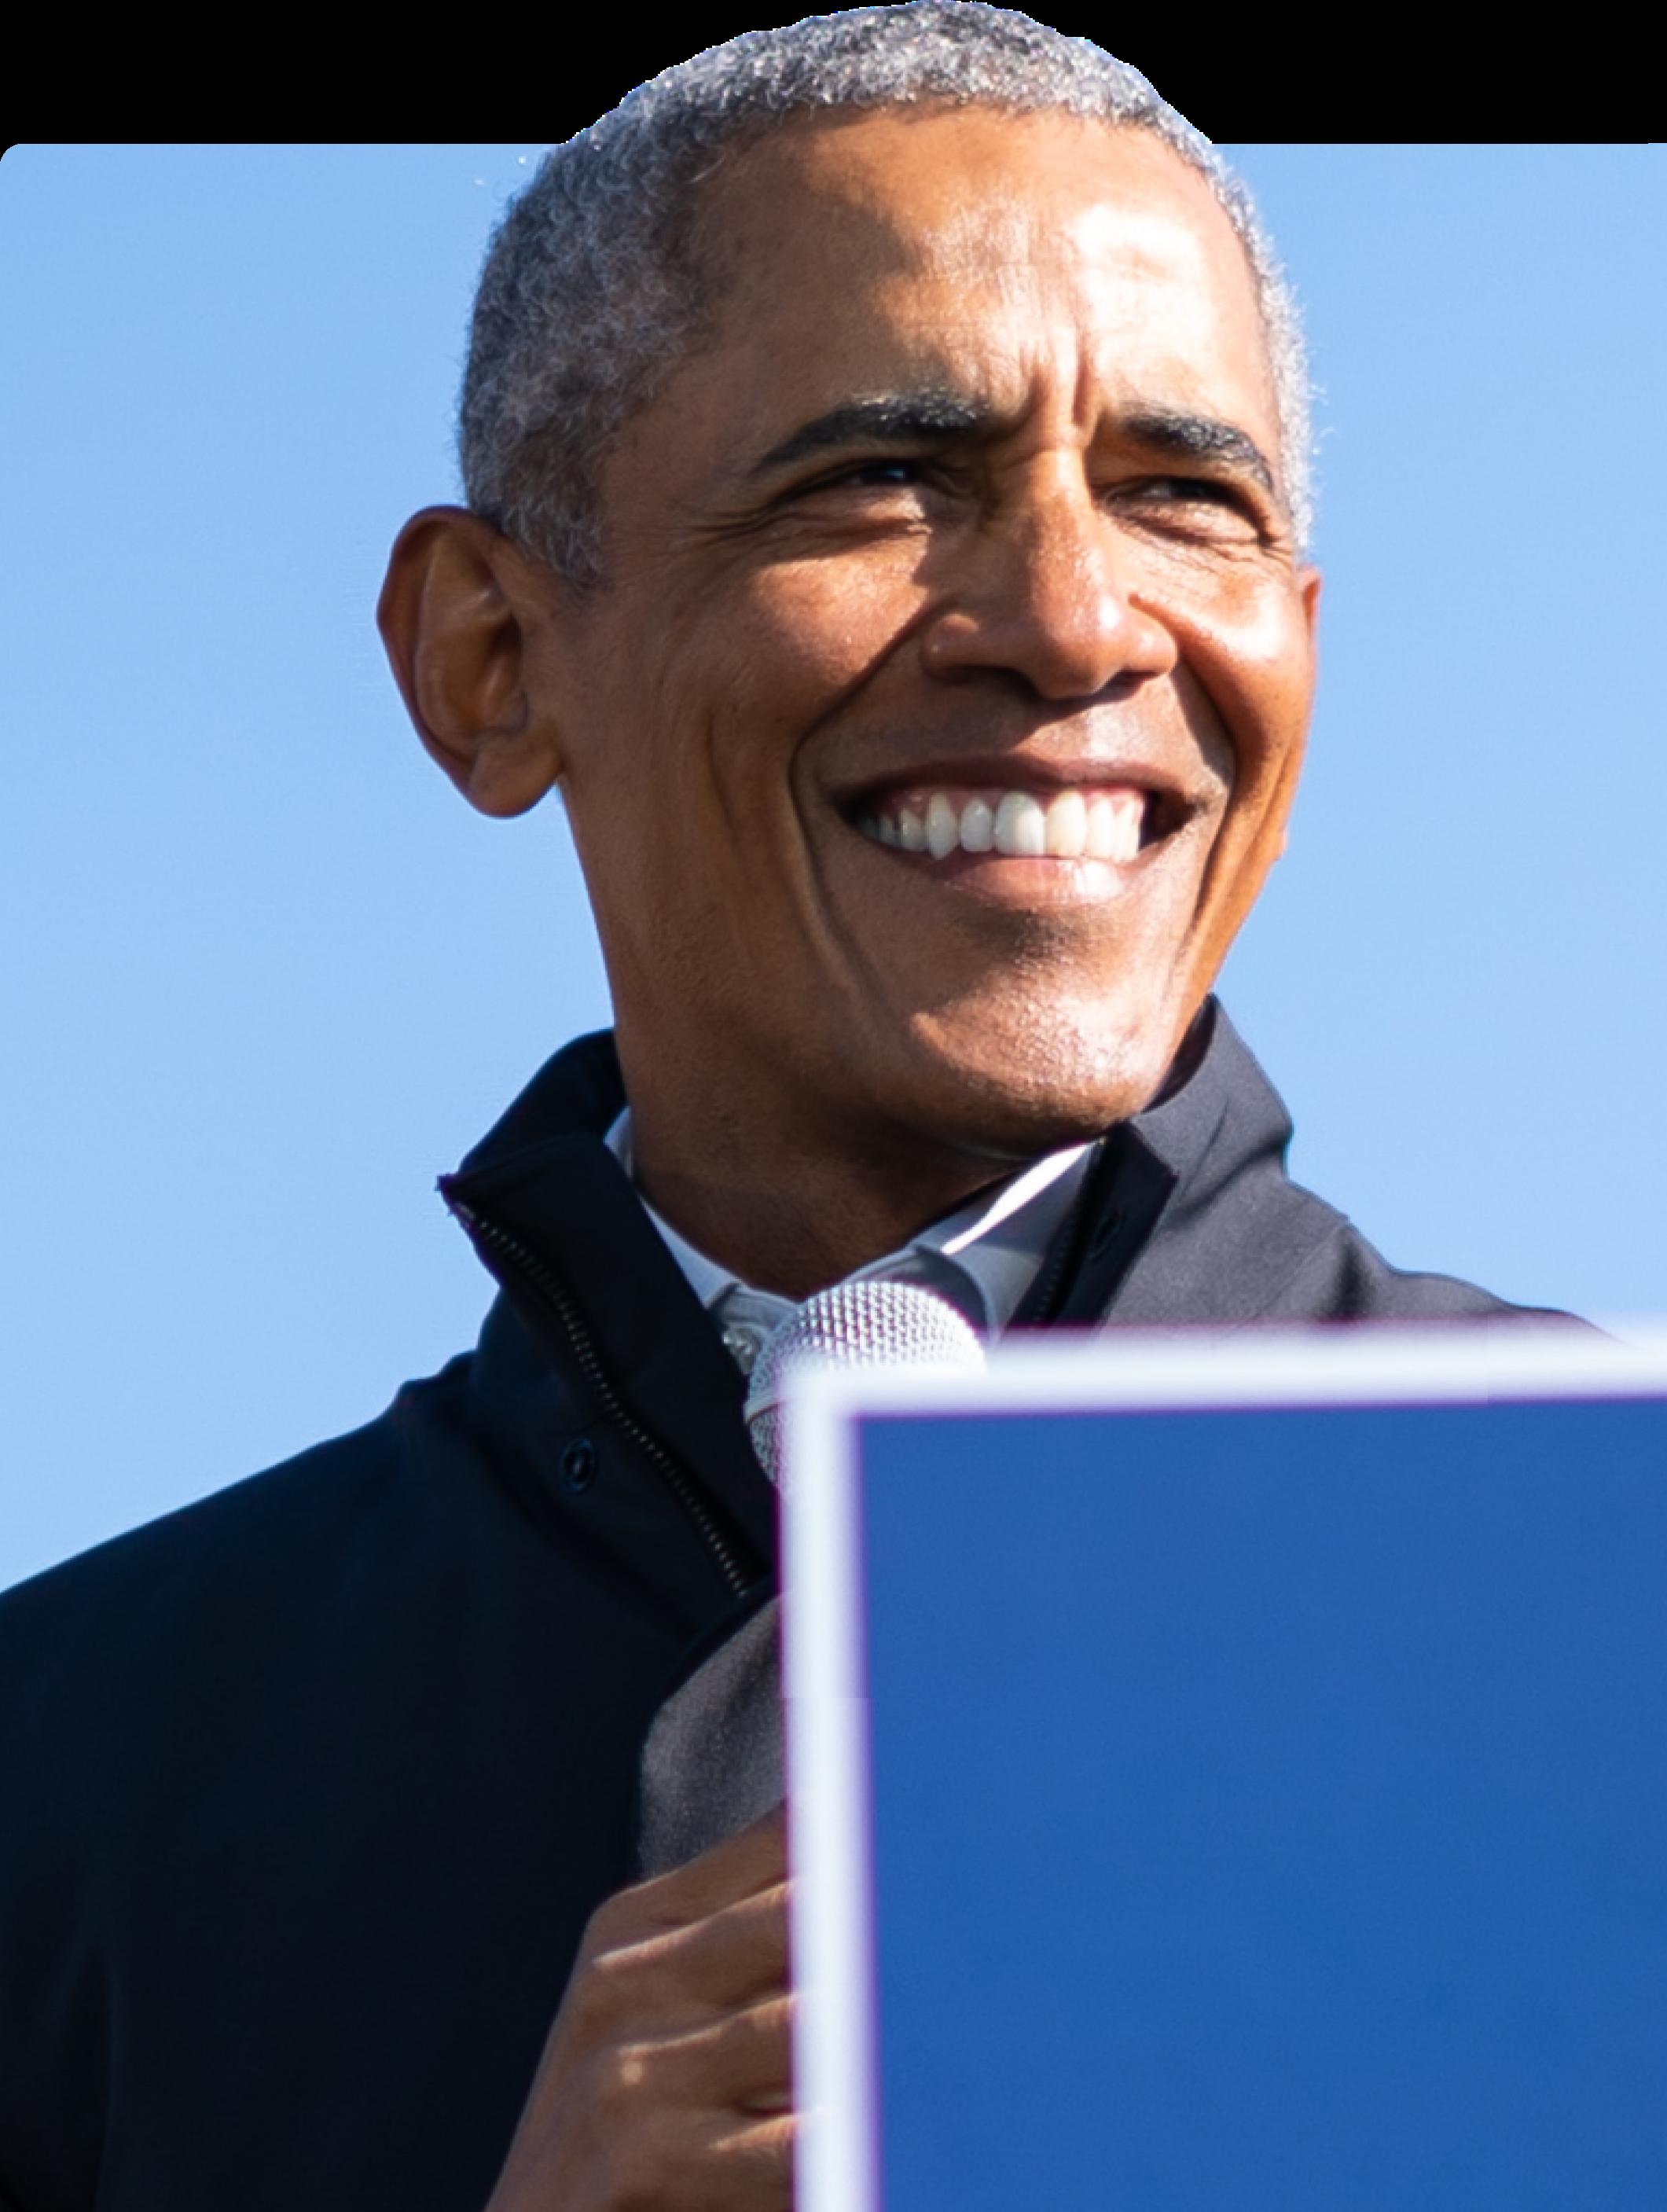 http://Barack%20Obama